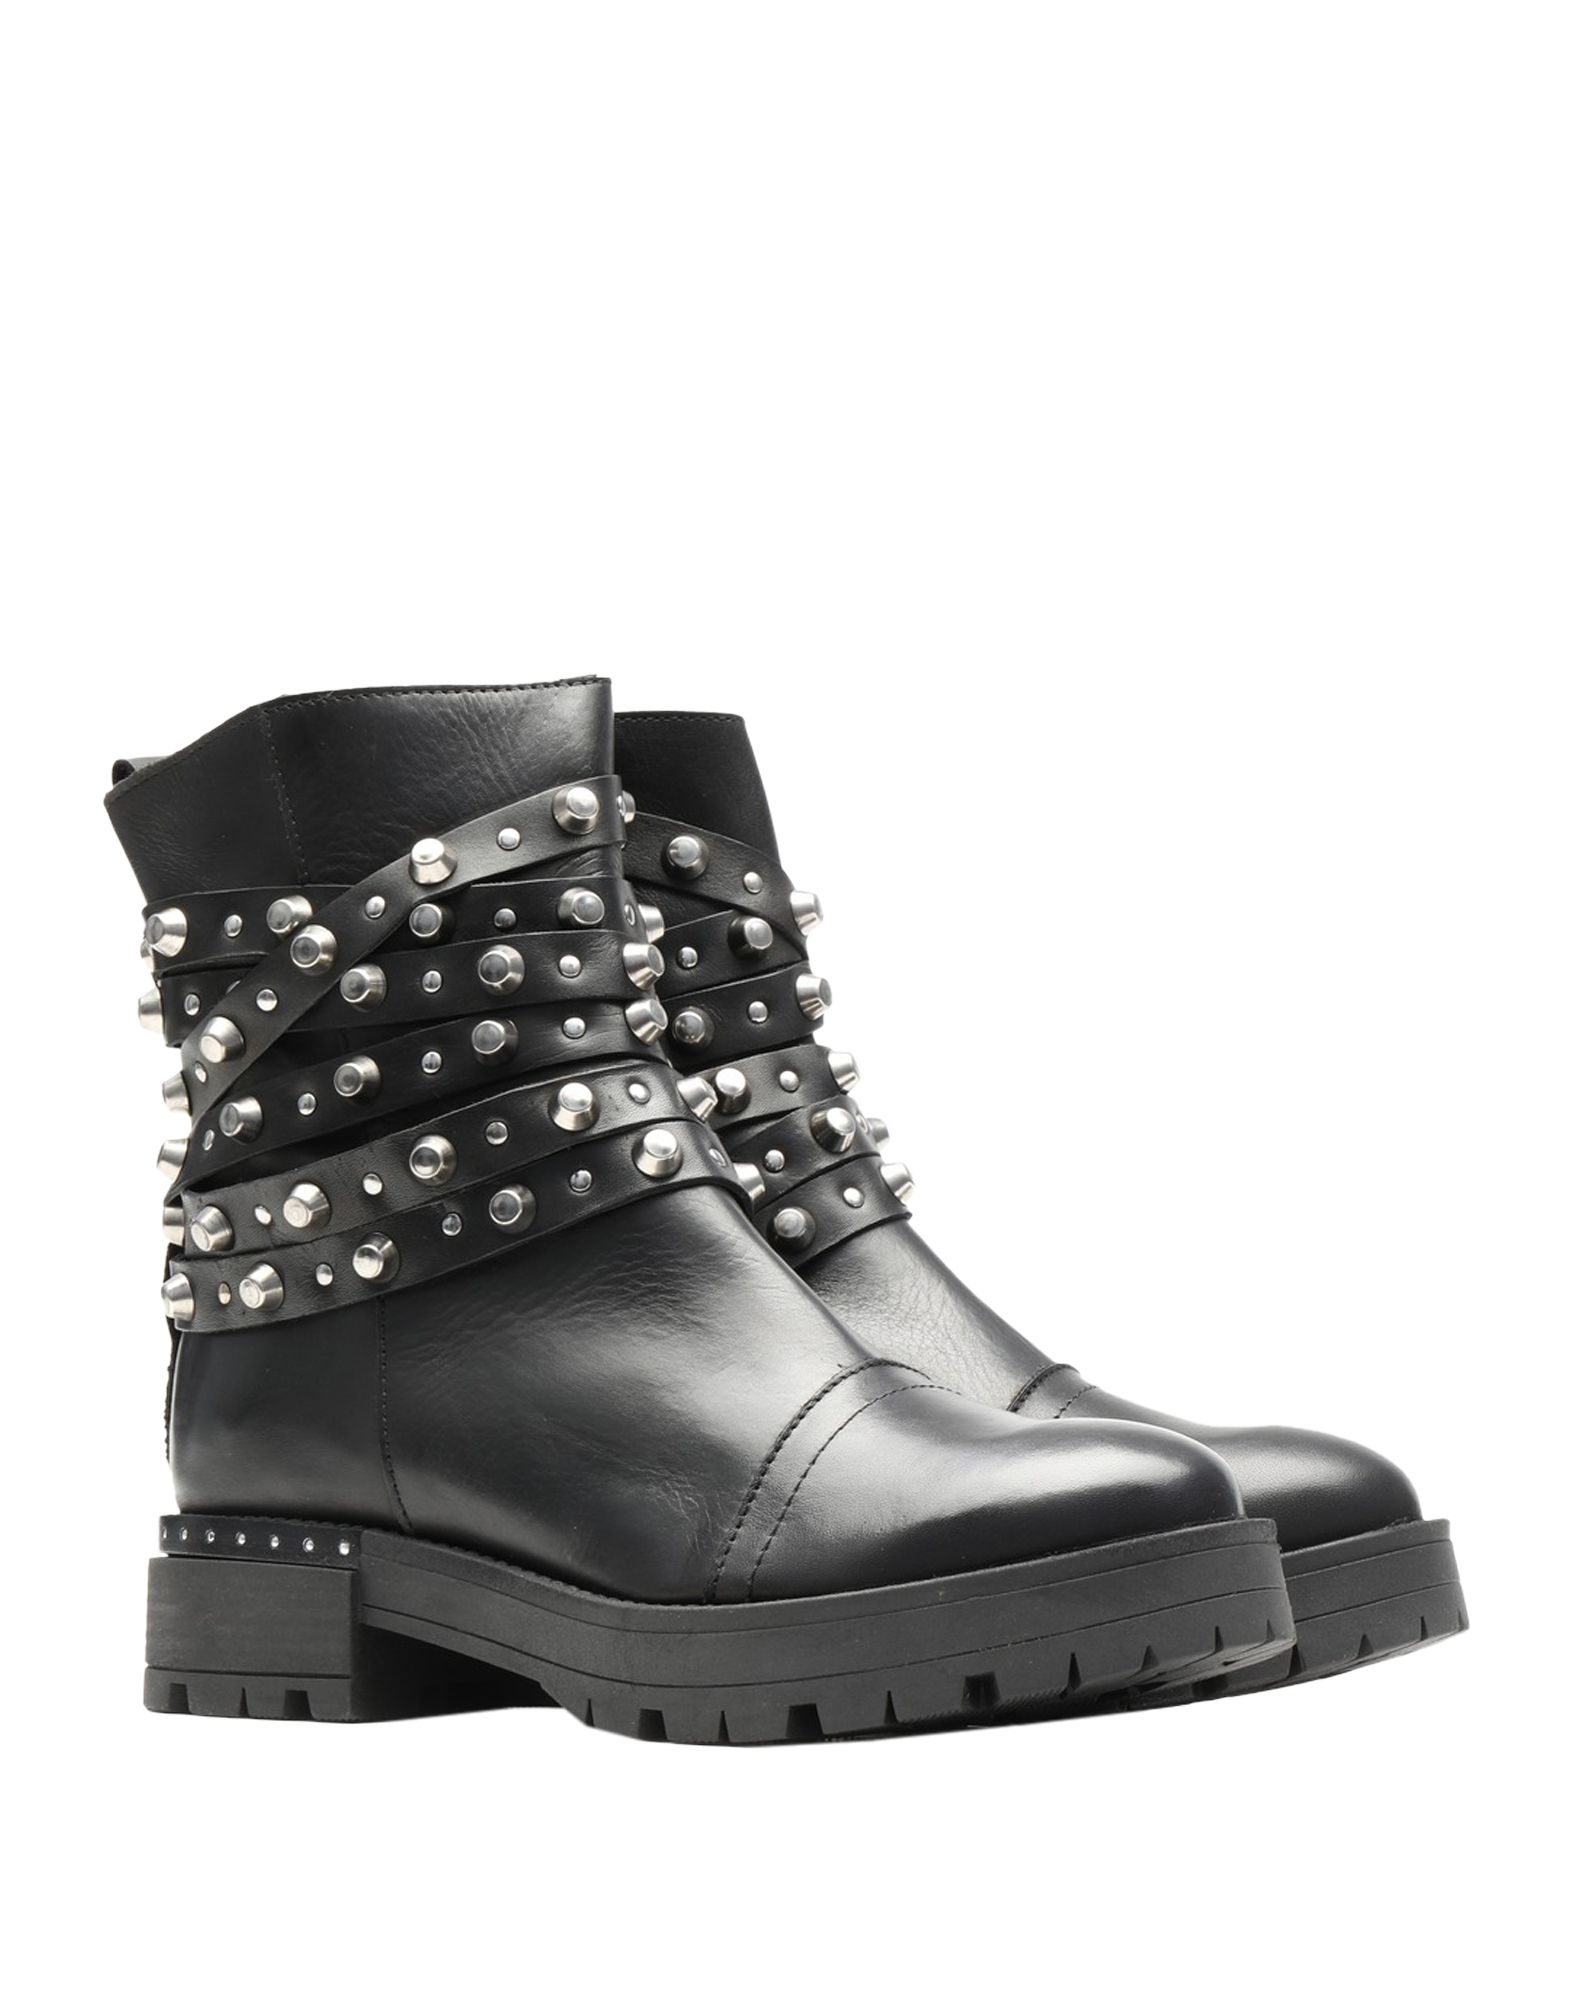 Pierre 11383087TB Darré Stiefelette Damen  11383087TB Pierre Gute Qualität beliebte Schuhe 3e1d07